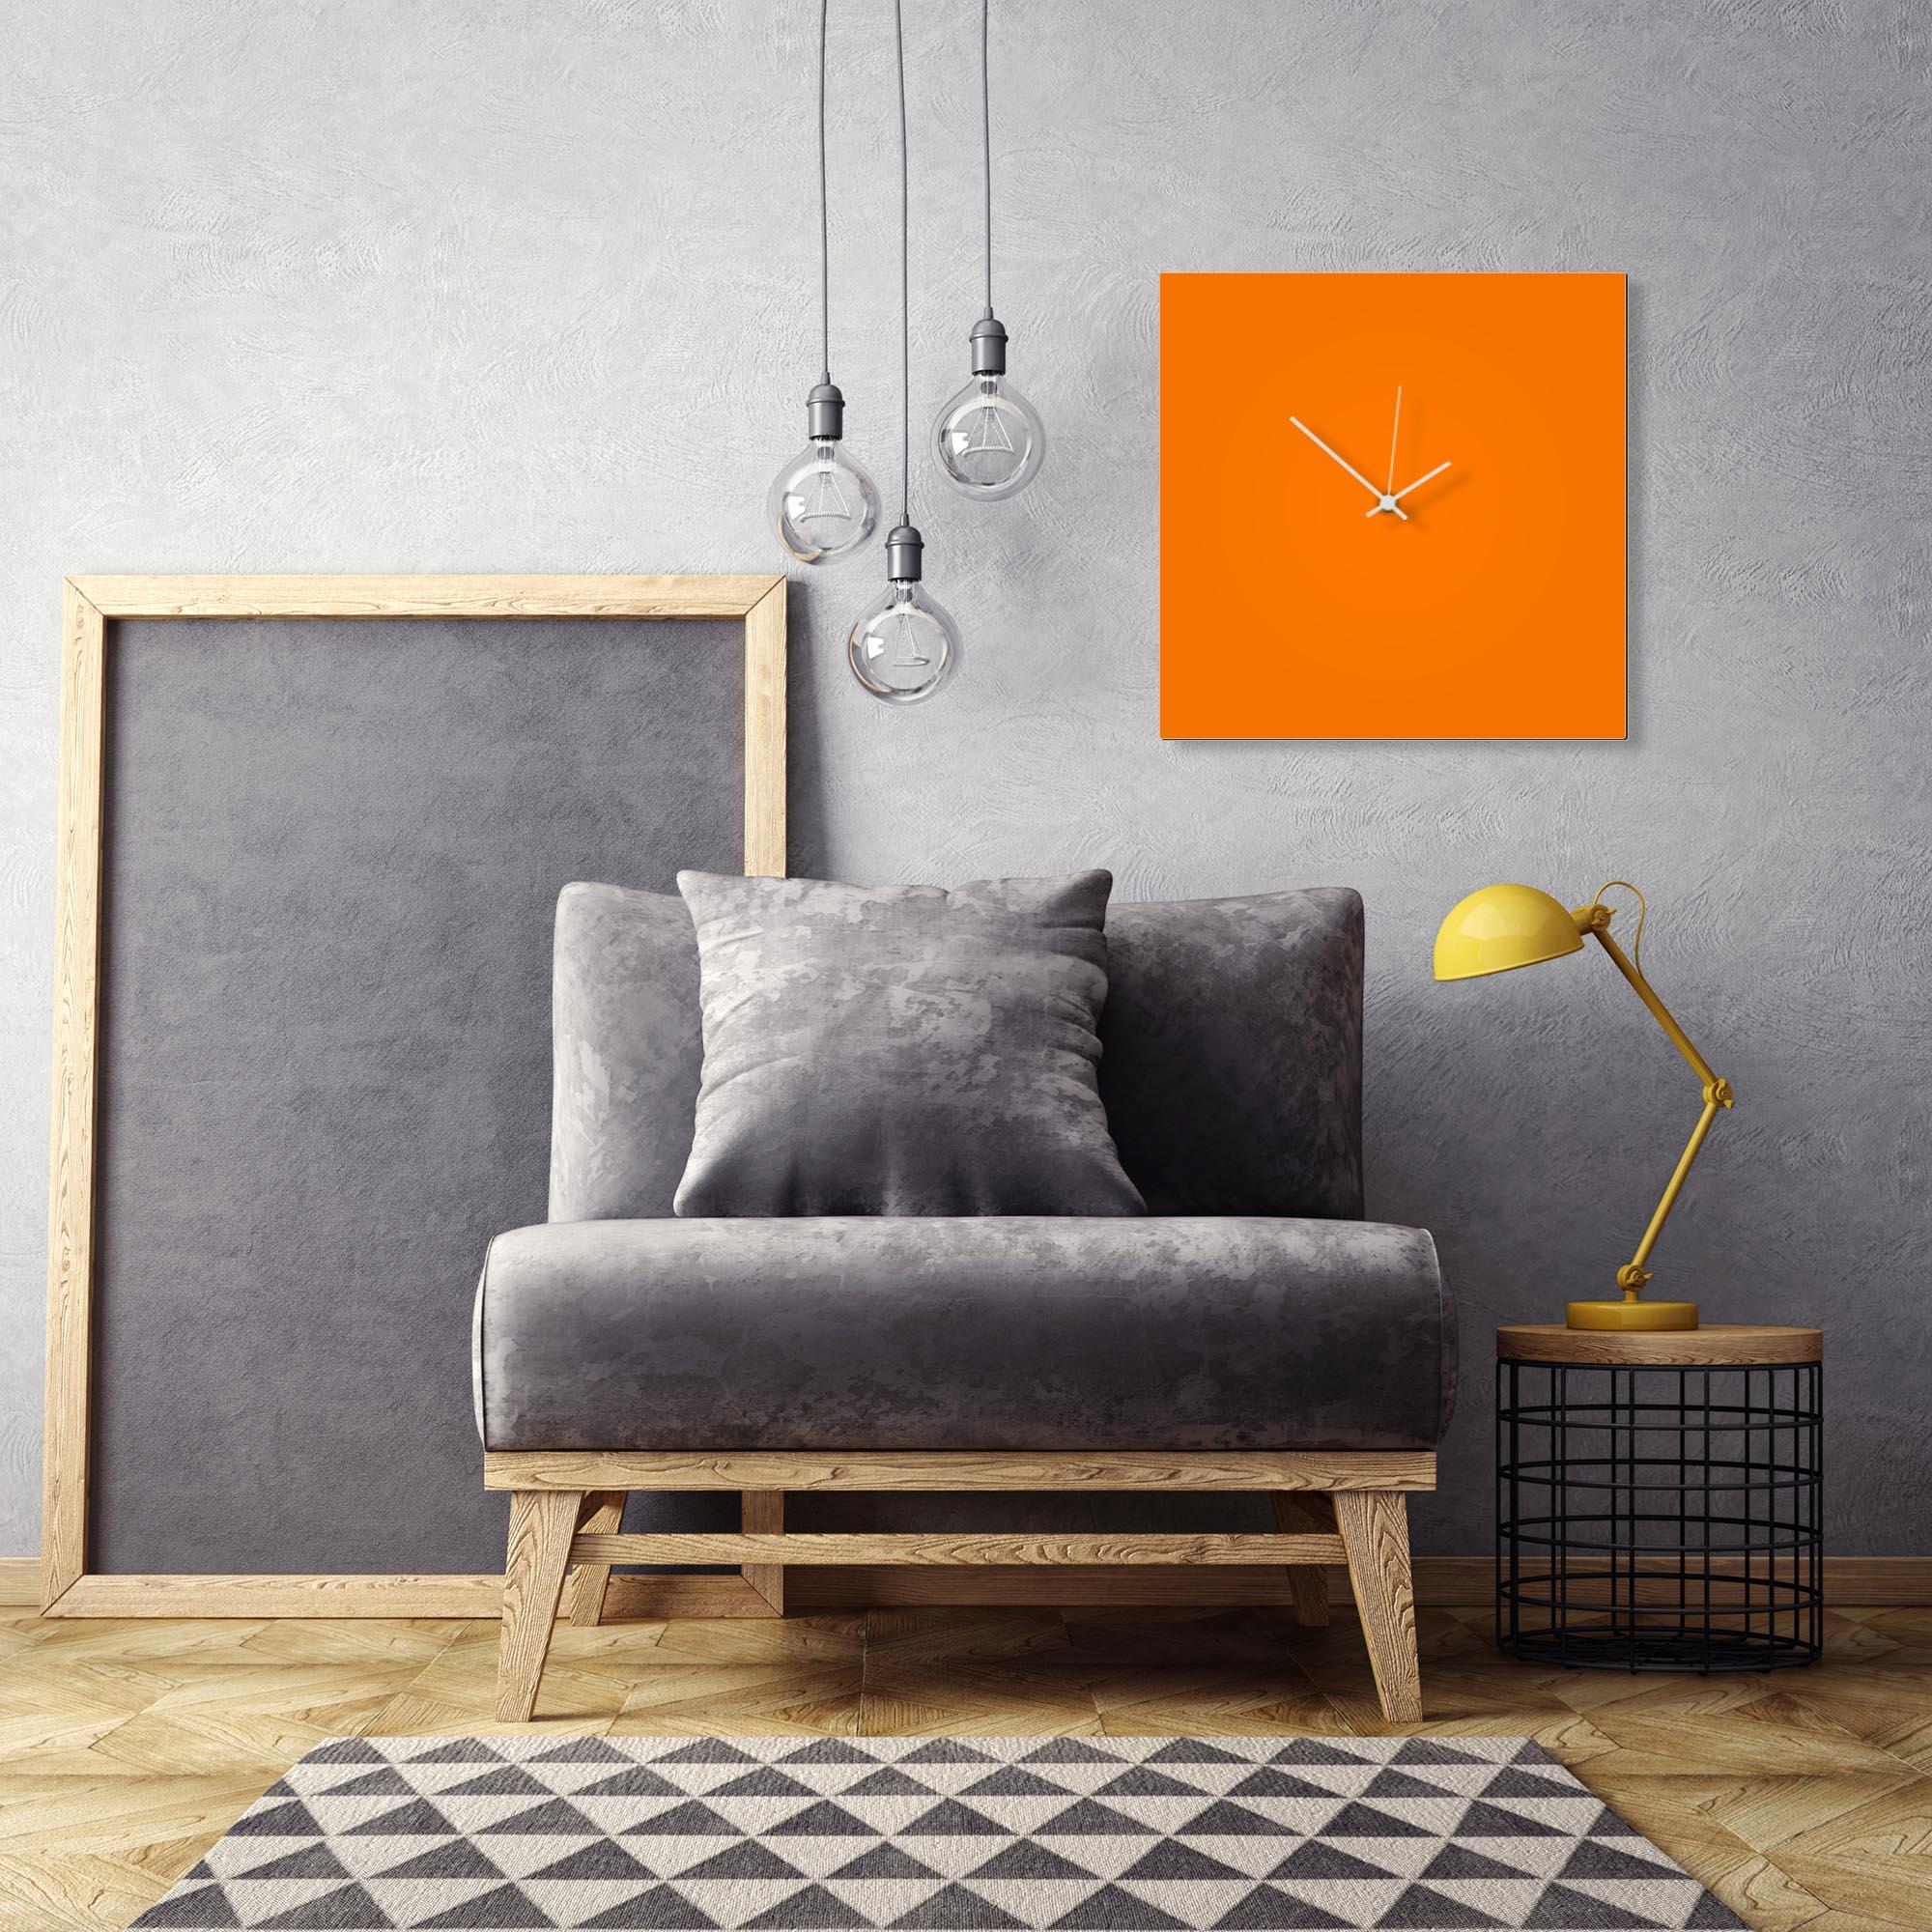 Orangeout White Square Clock Large by Adam Schwoeppe Contemporary Clock on Aluminum Polymetal - Alternate View 1